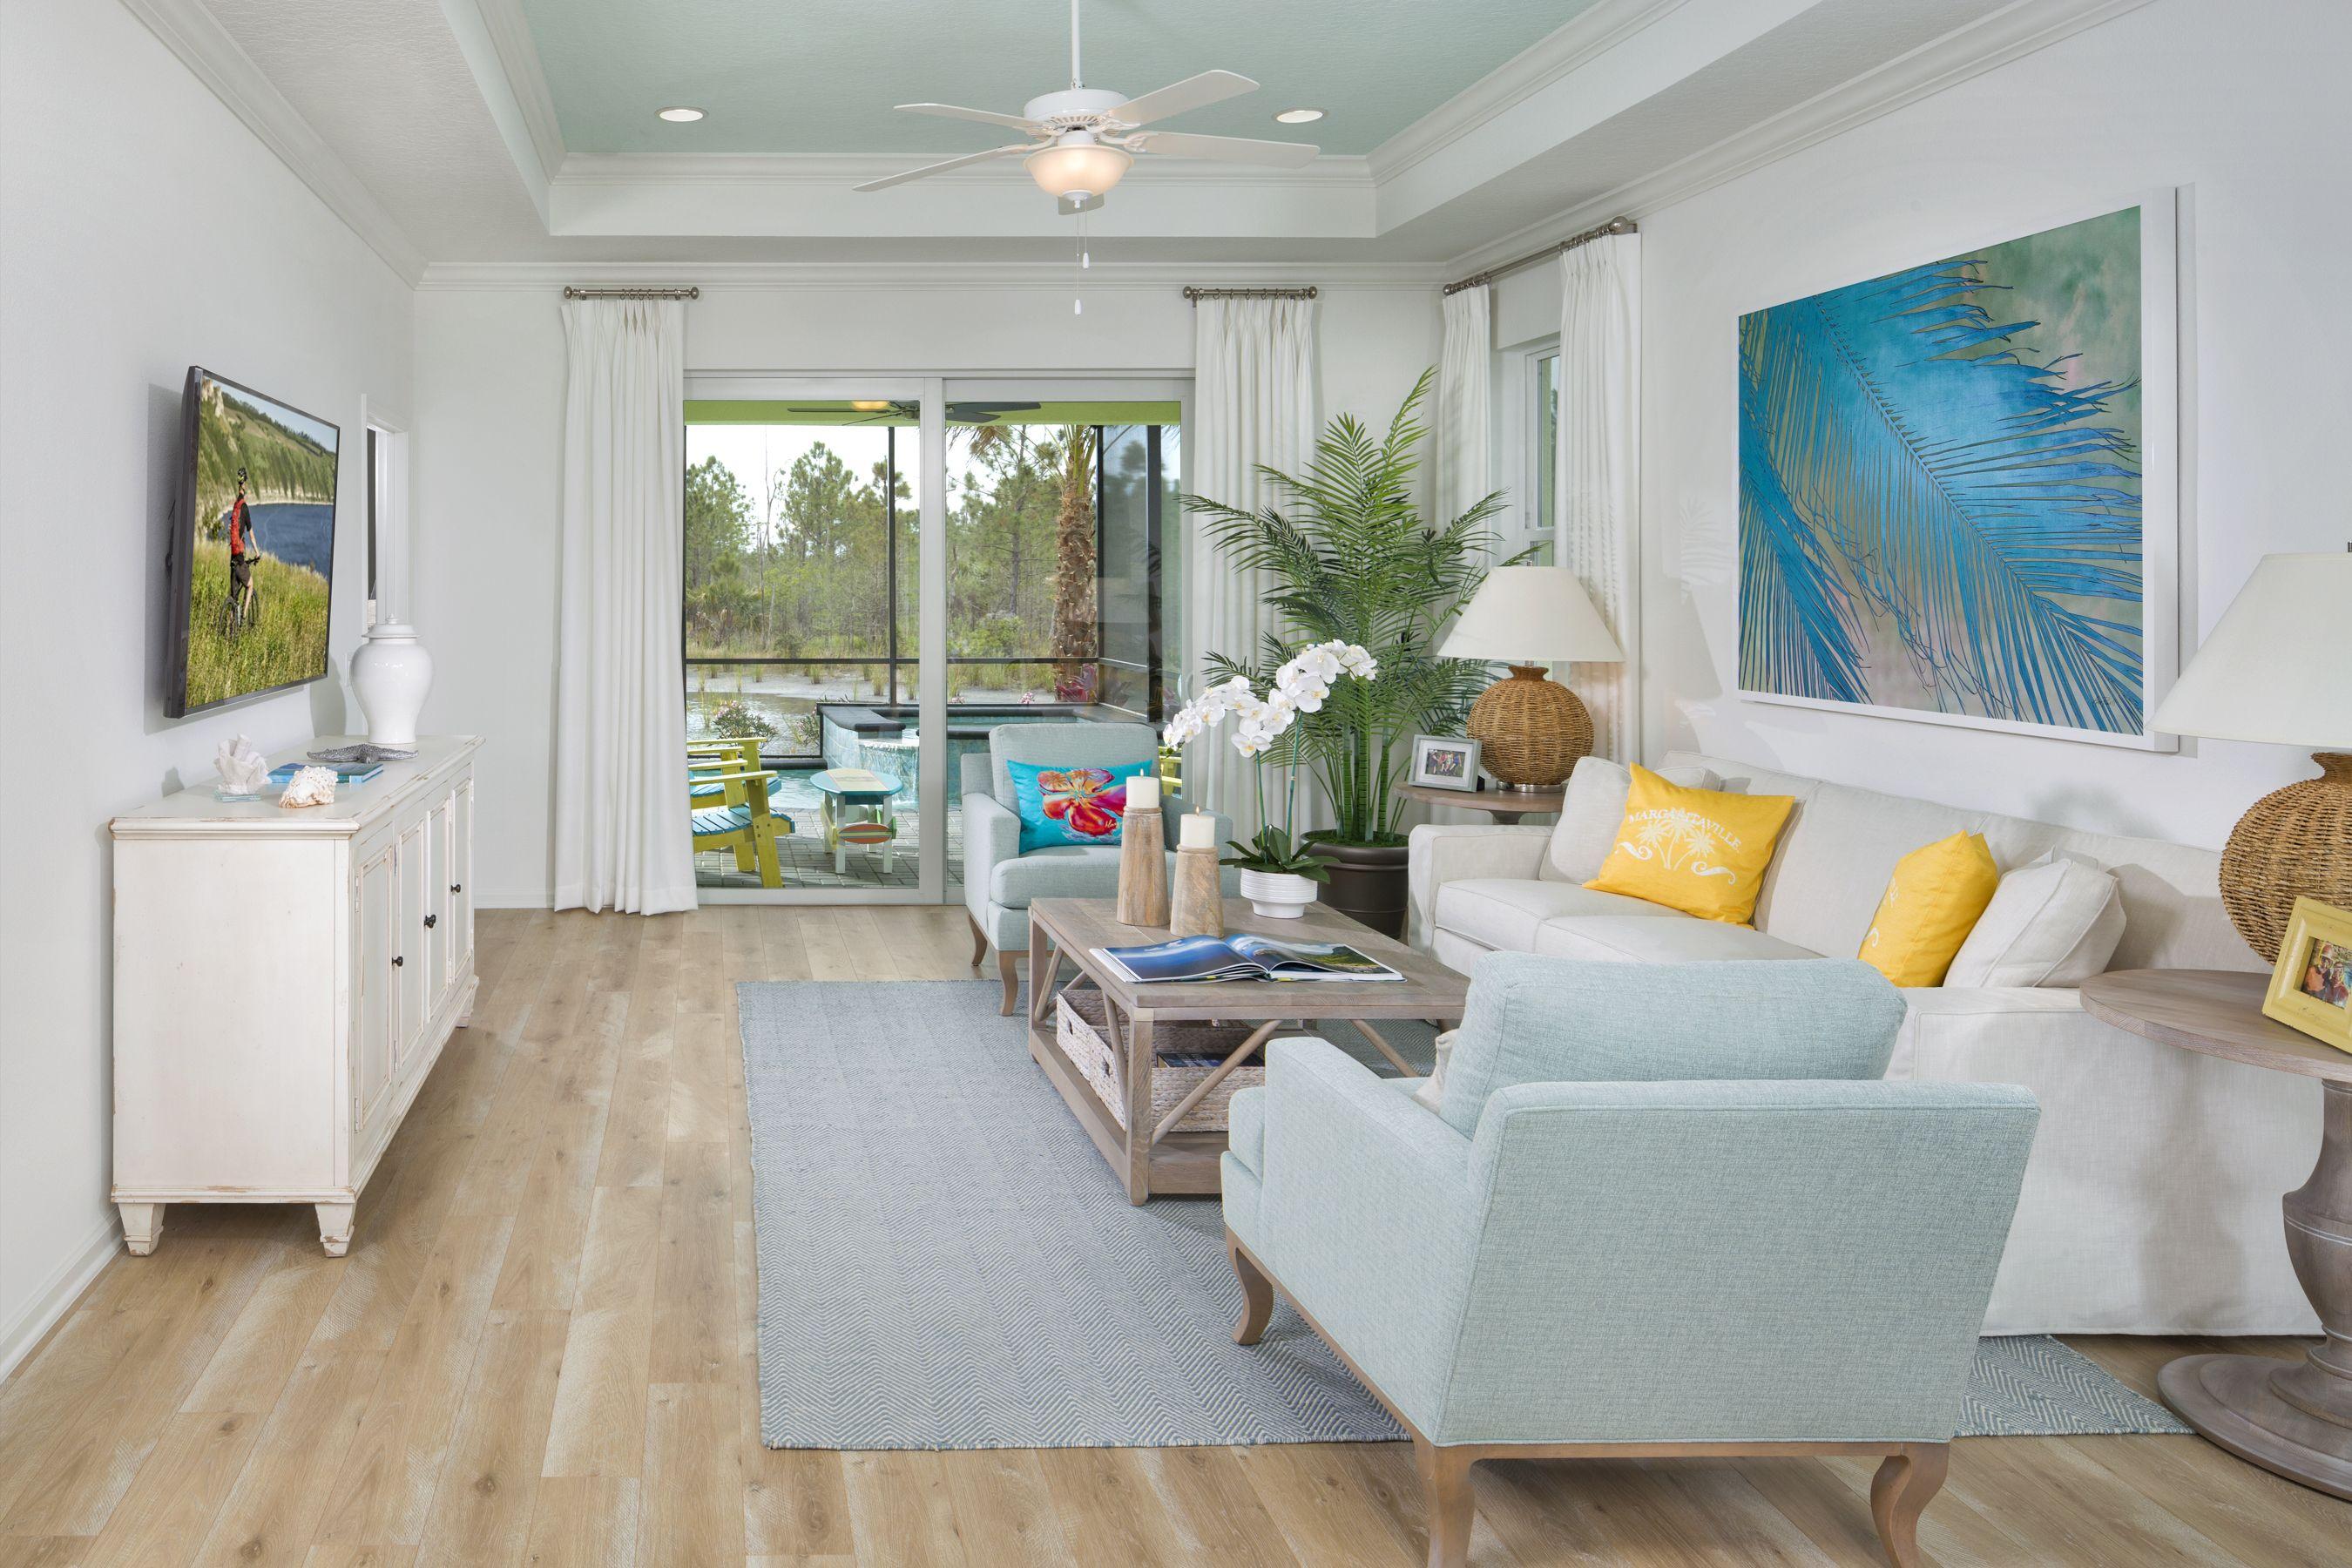 Jamaica Model At Latitude Margaritaville Daytona Beach Minto Communities Retirement Community Outdoor Furniture Sets Cozy Interior